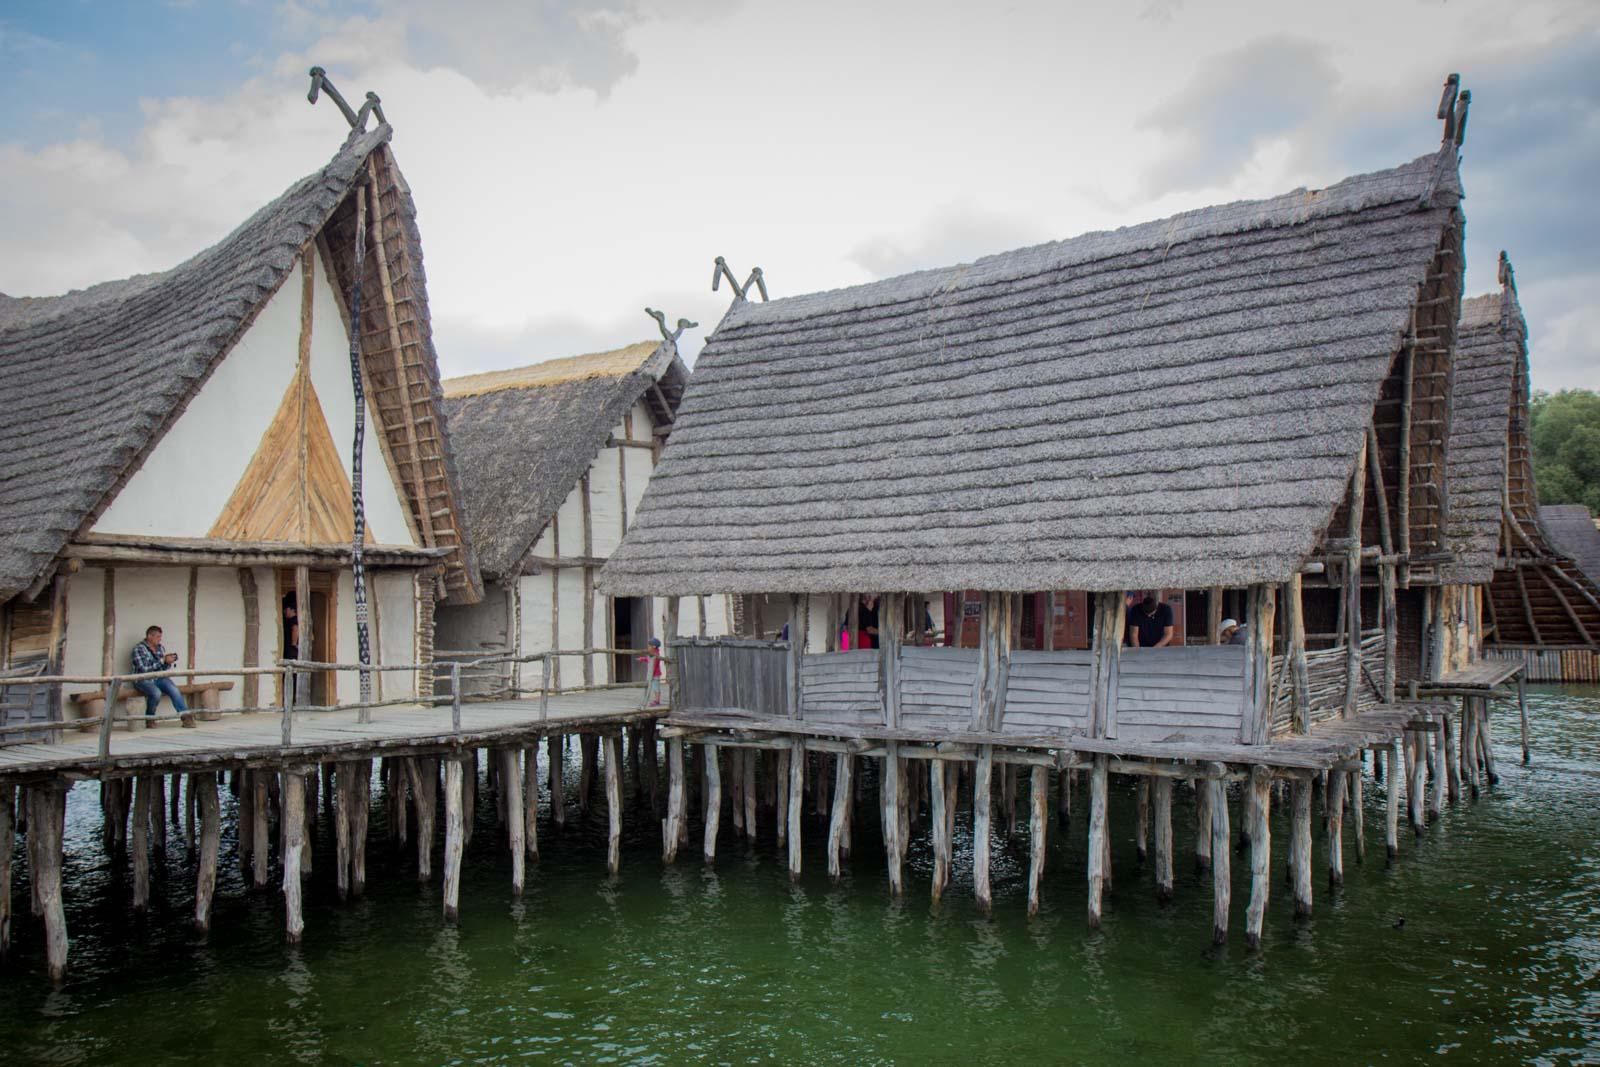 Pfahlbau Pile Dwelling Museum, Unteruhldingen, Germany